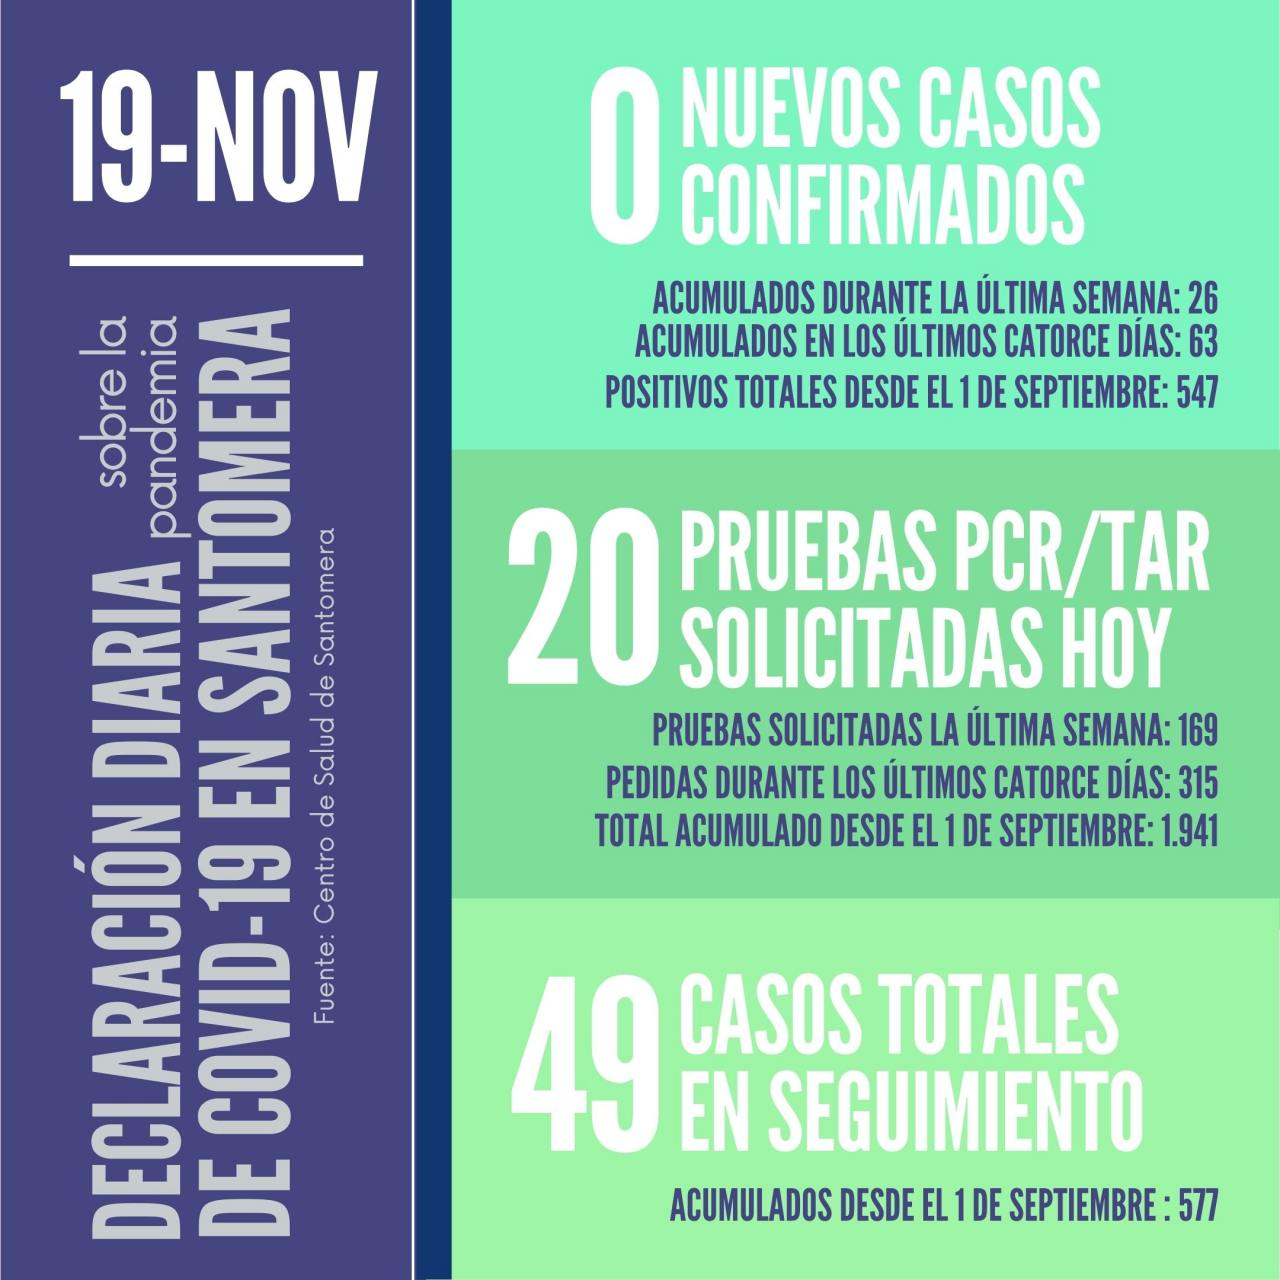 20201119_Datos-COVID-19-Santomera